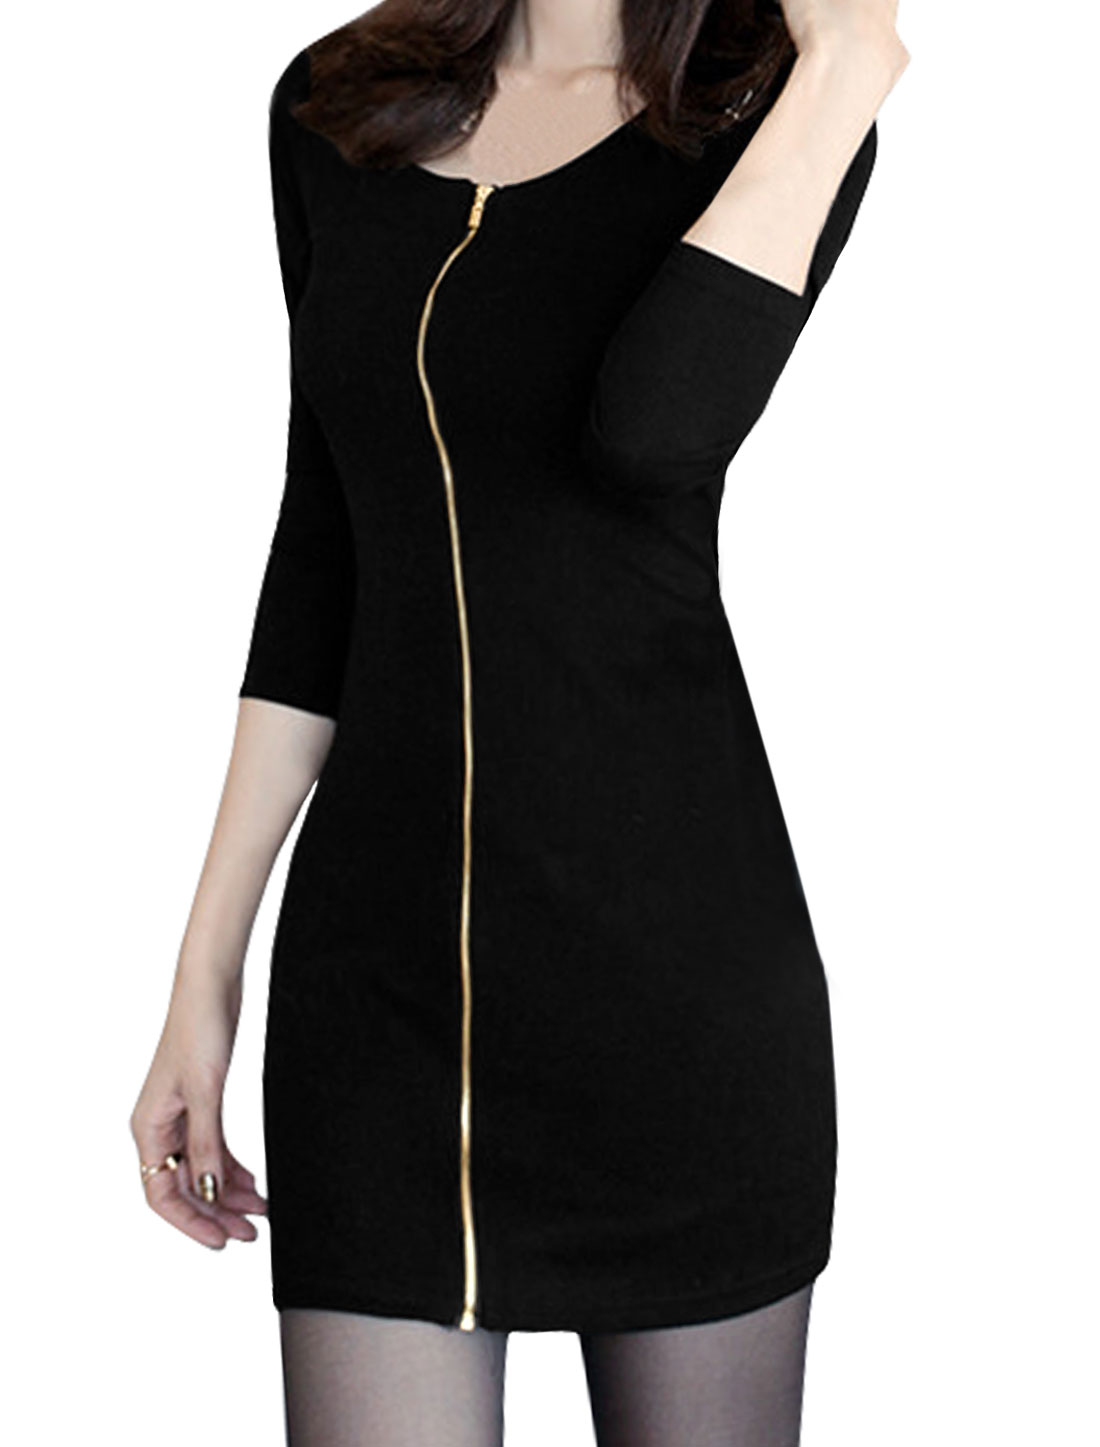 Women Scoop Neck Exposed Zipper Front Sheath Dress Black XS